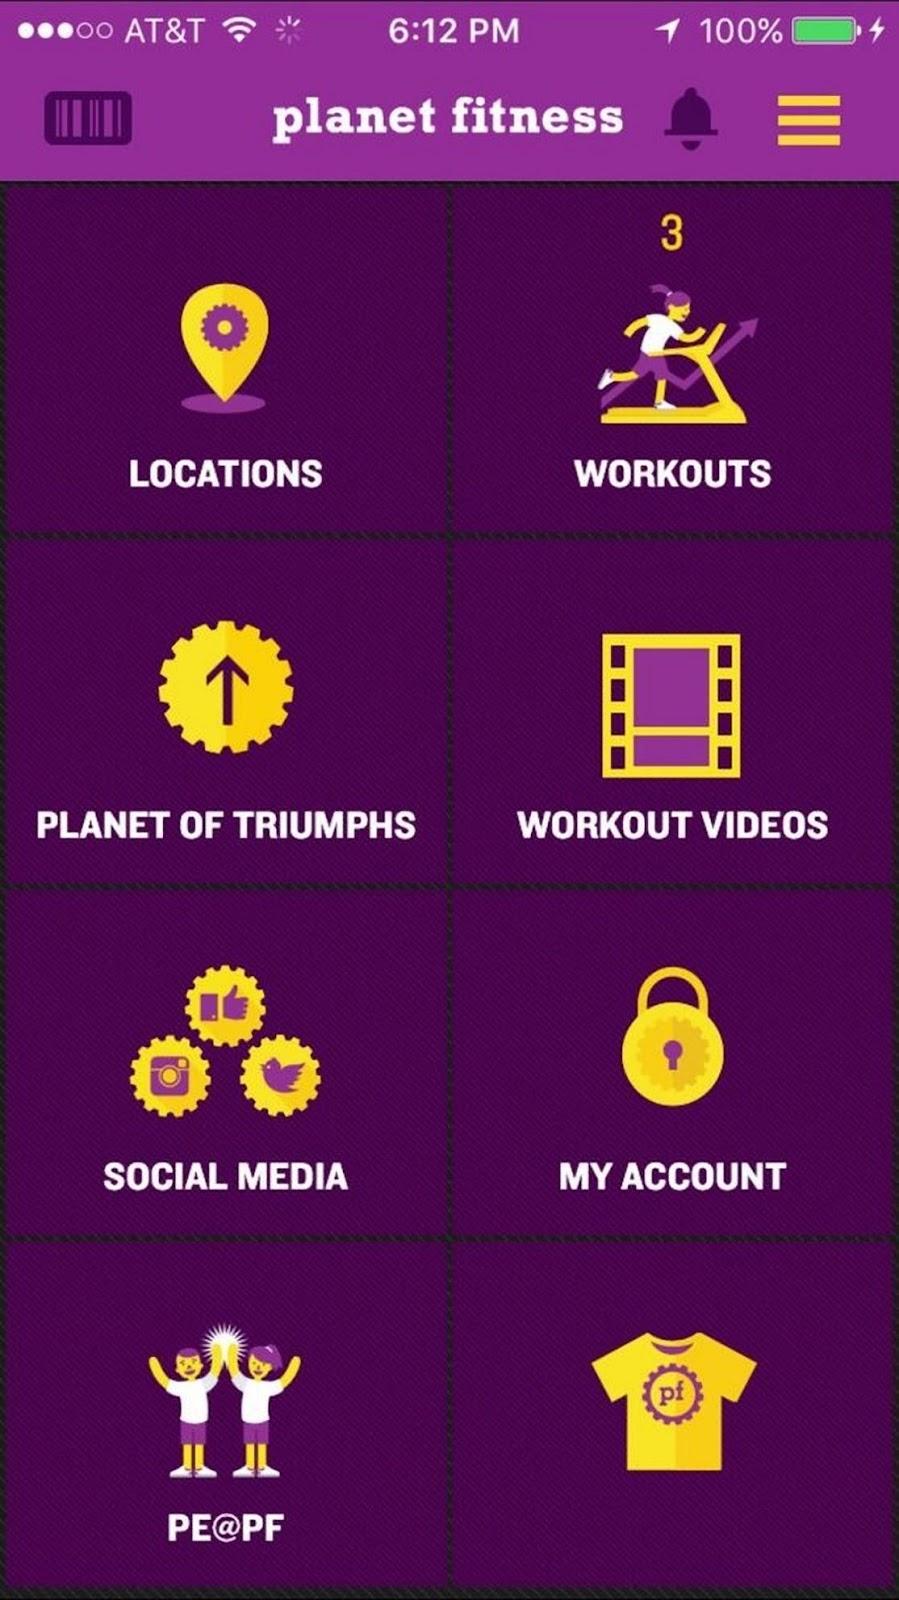 Planet Fitness app